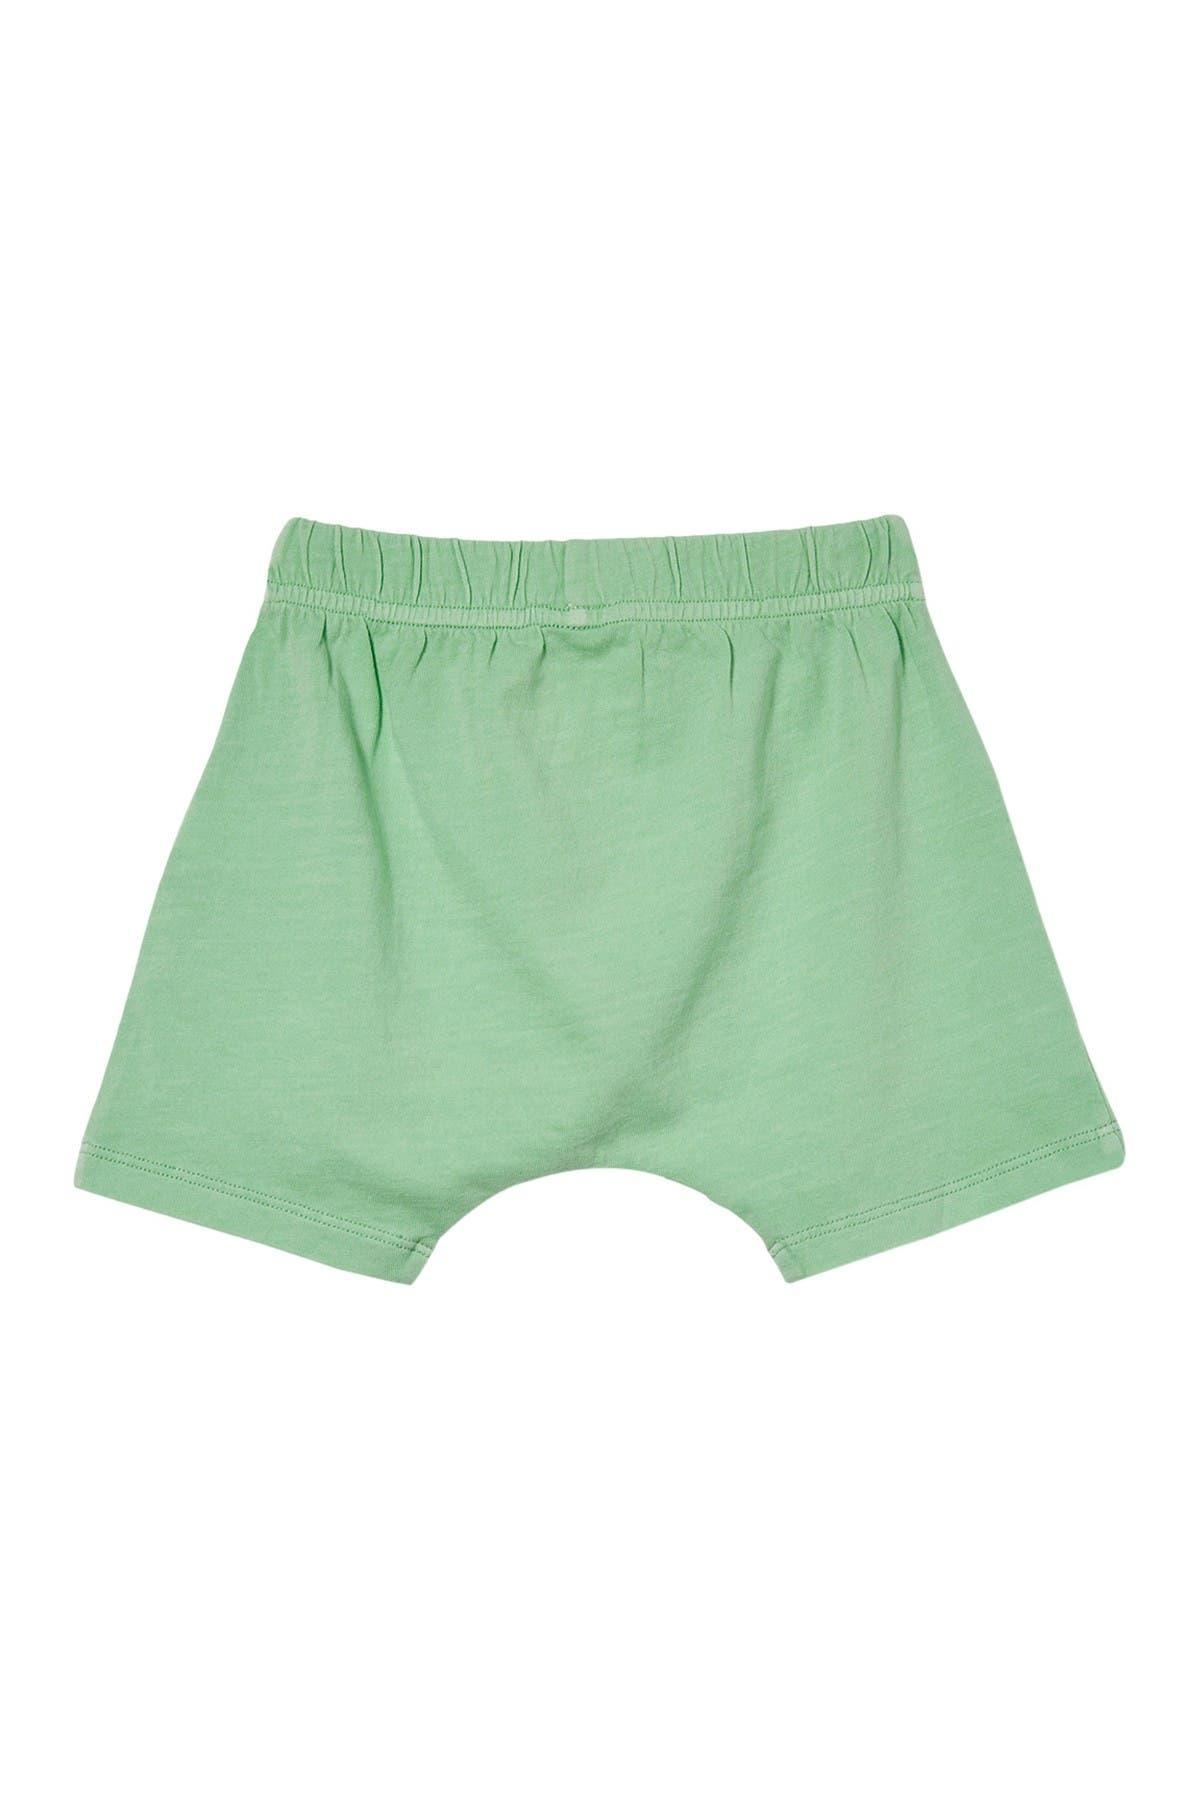 Image of Cotton On Mikko Shorts